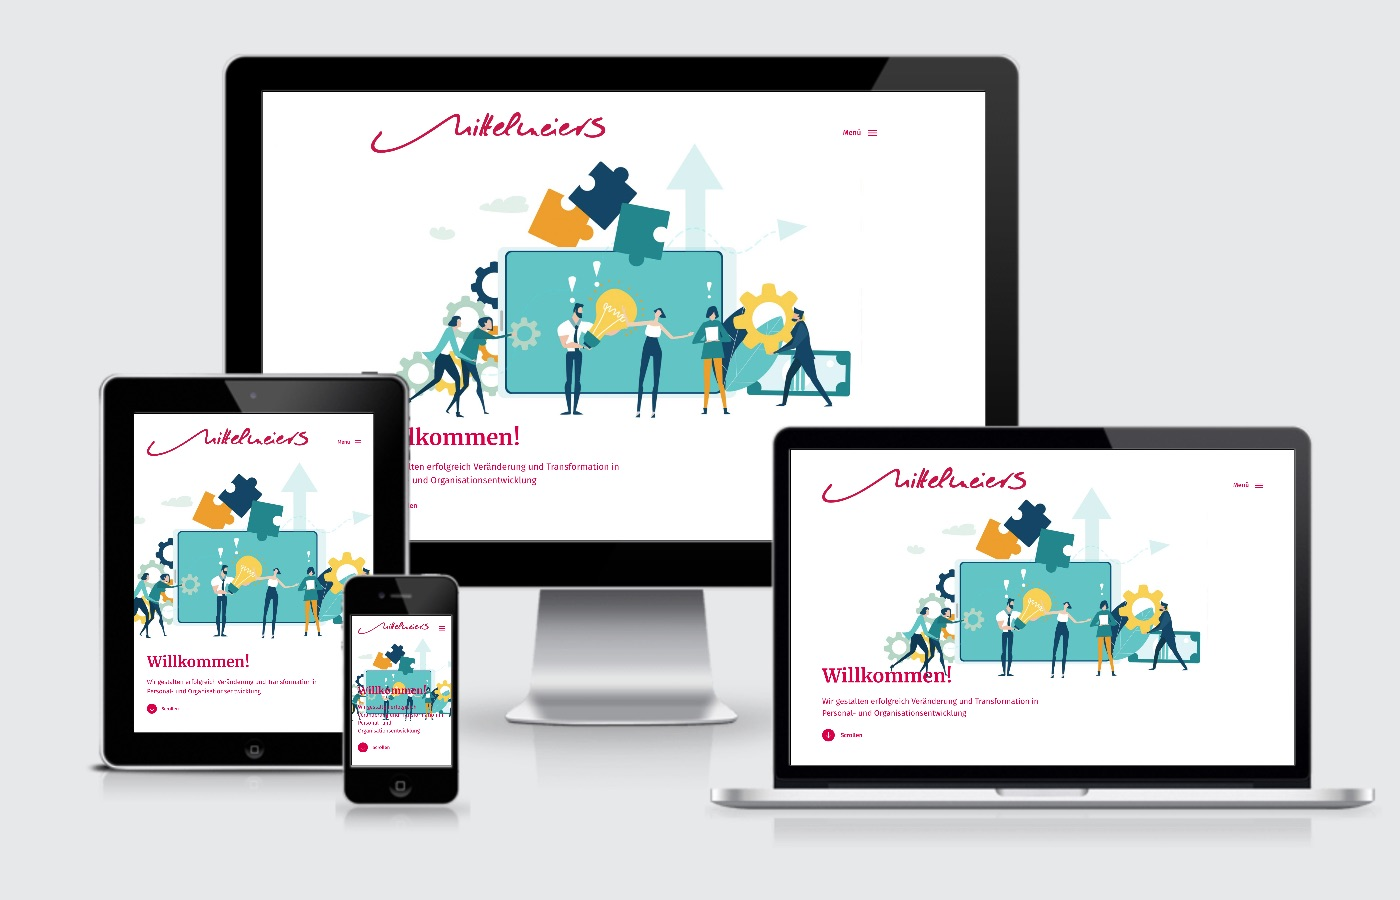 Internetauftritt Mittelmeiers Beratung Frankfurt Wiesloch Webdesign